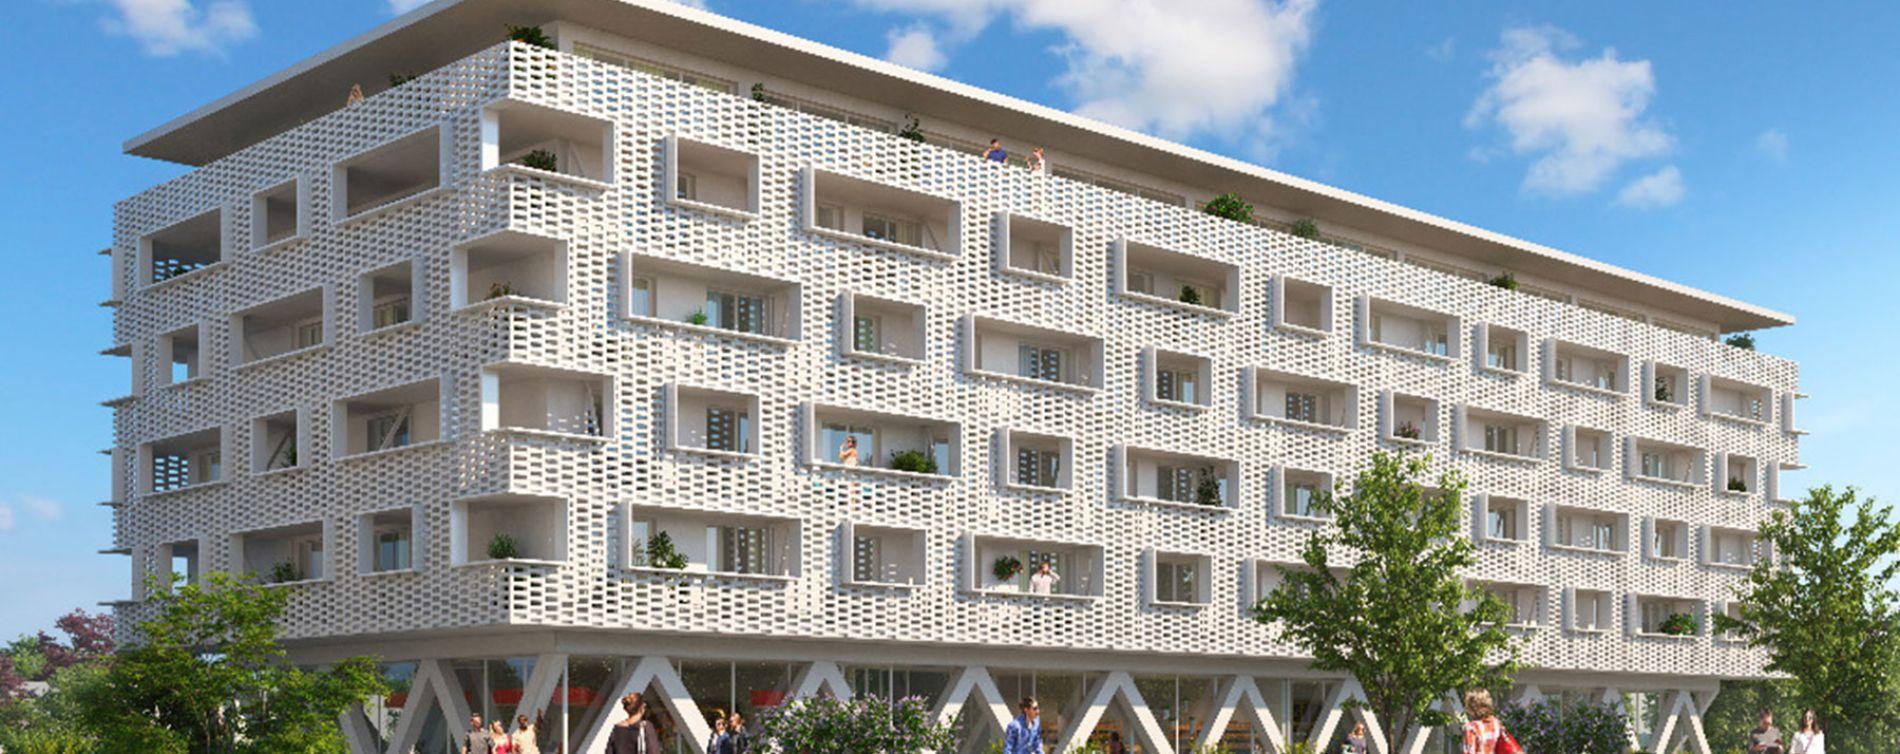 Illkirch-Graffenstaden : programme immobilier neuve « Unitha » en Loi Pinel